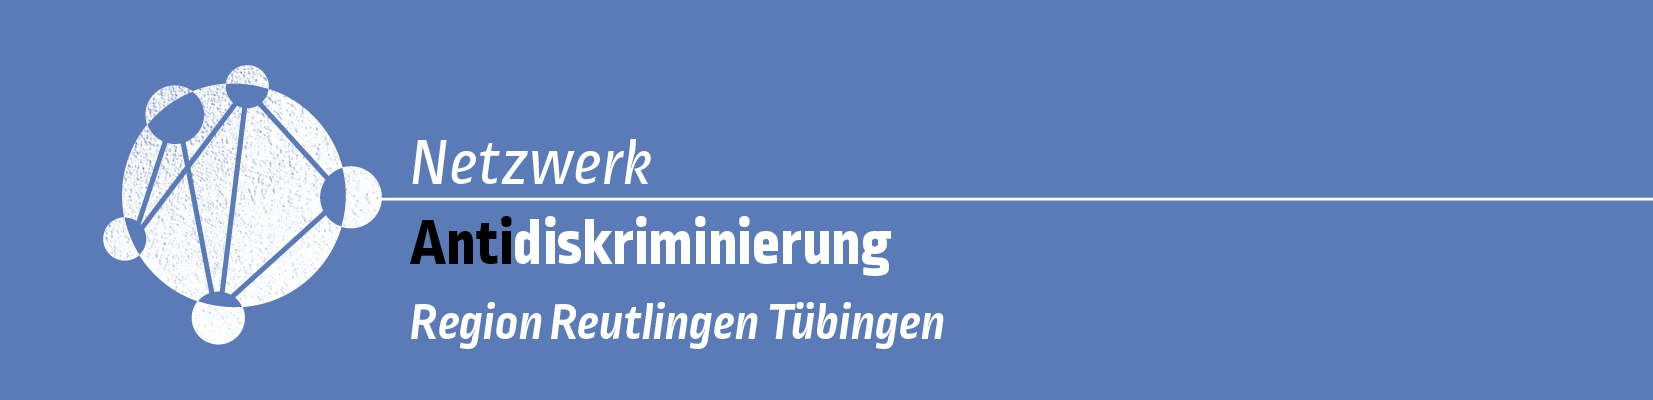 Logo des Netzwerks Antidiskriminierung e.V.